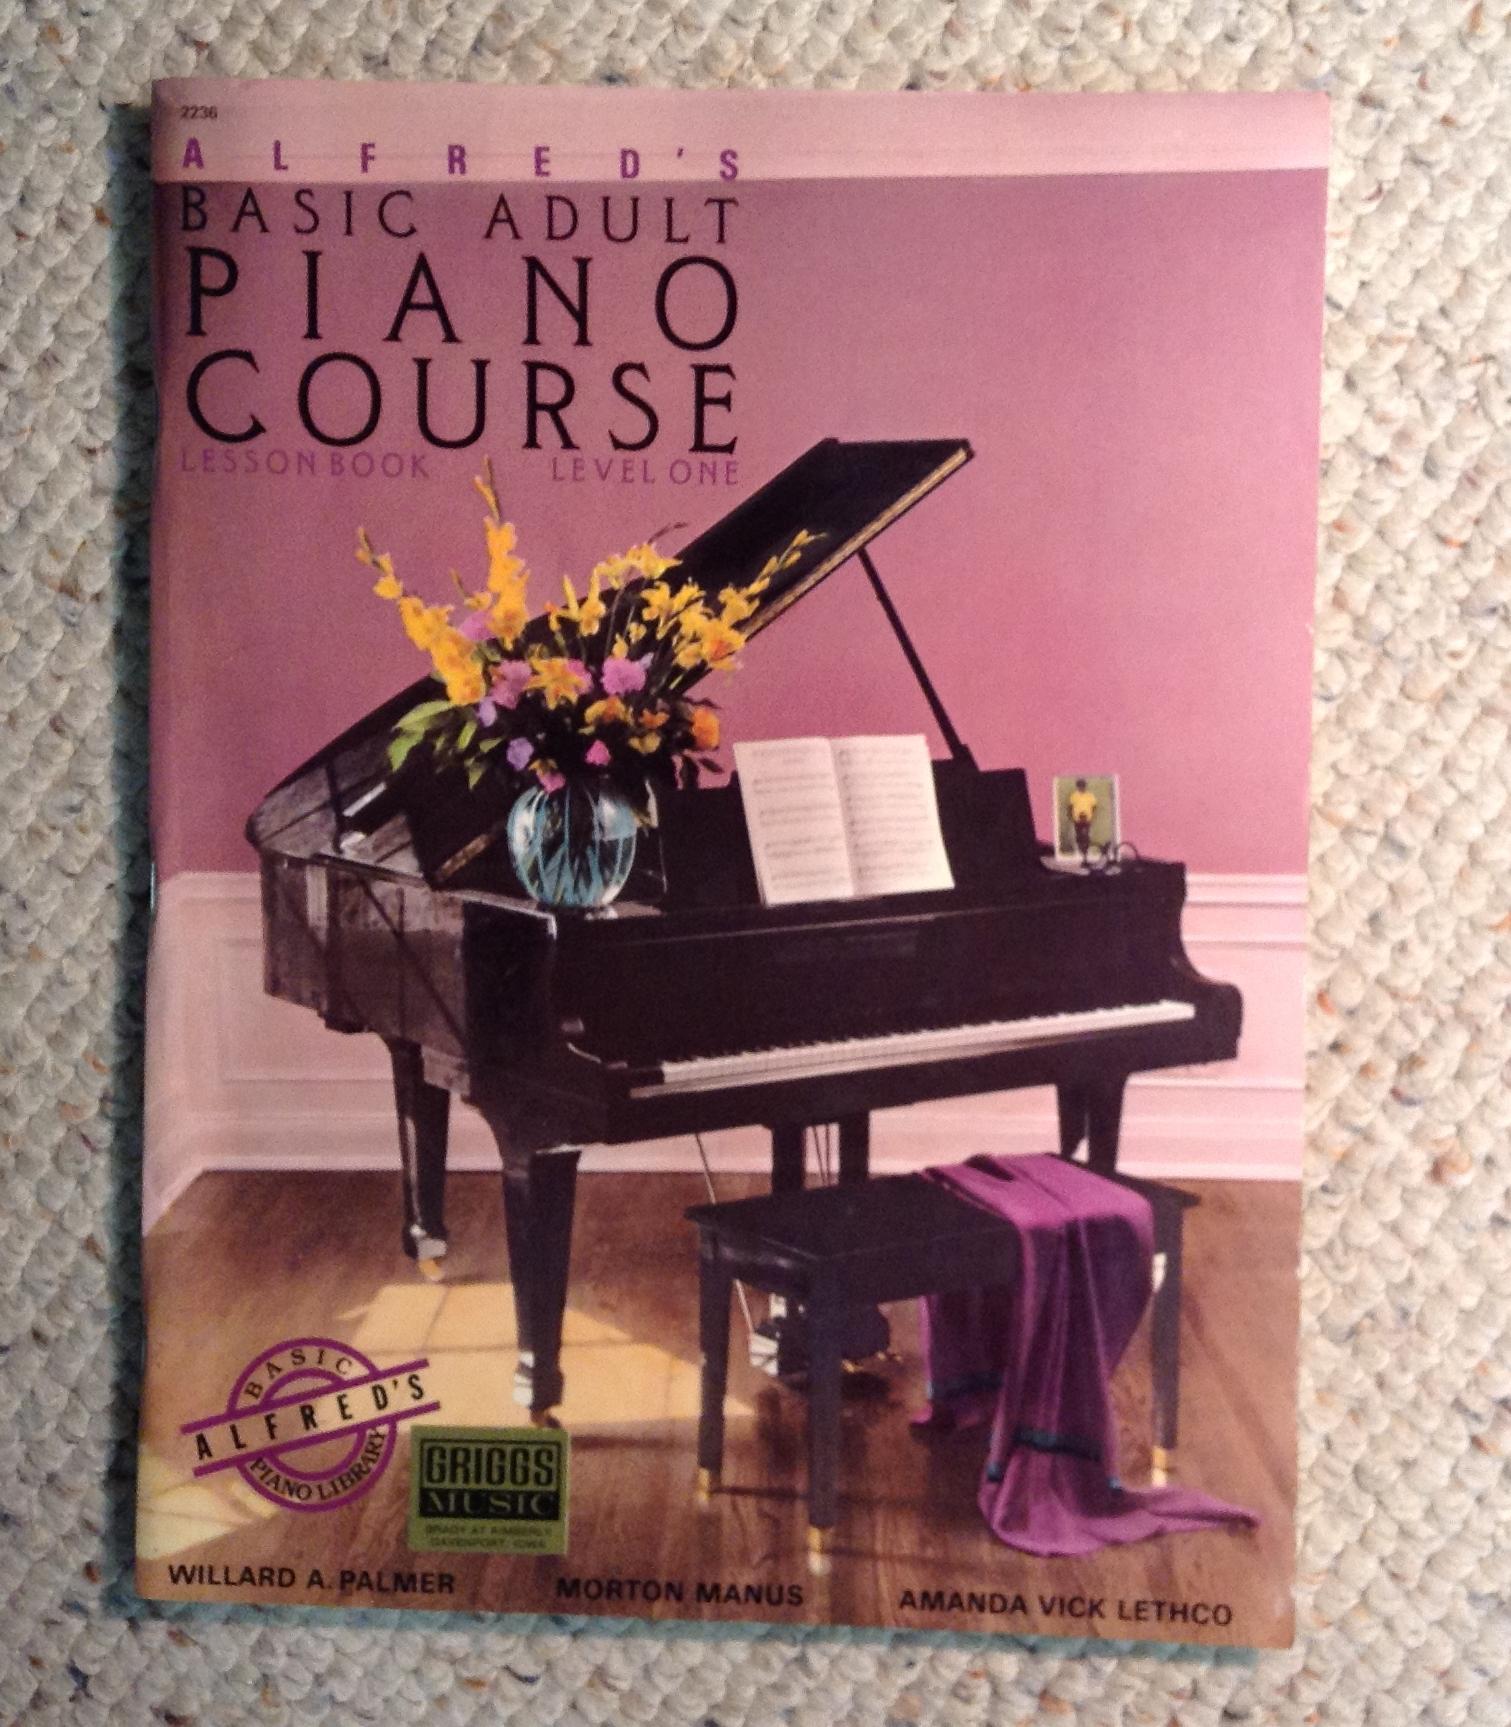 Euphonic Studio Piano Curriculum | Euphonic Studio Music Lessons